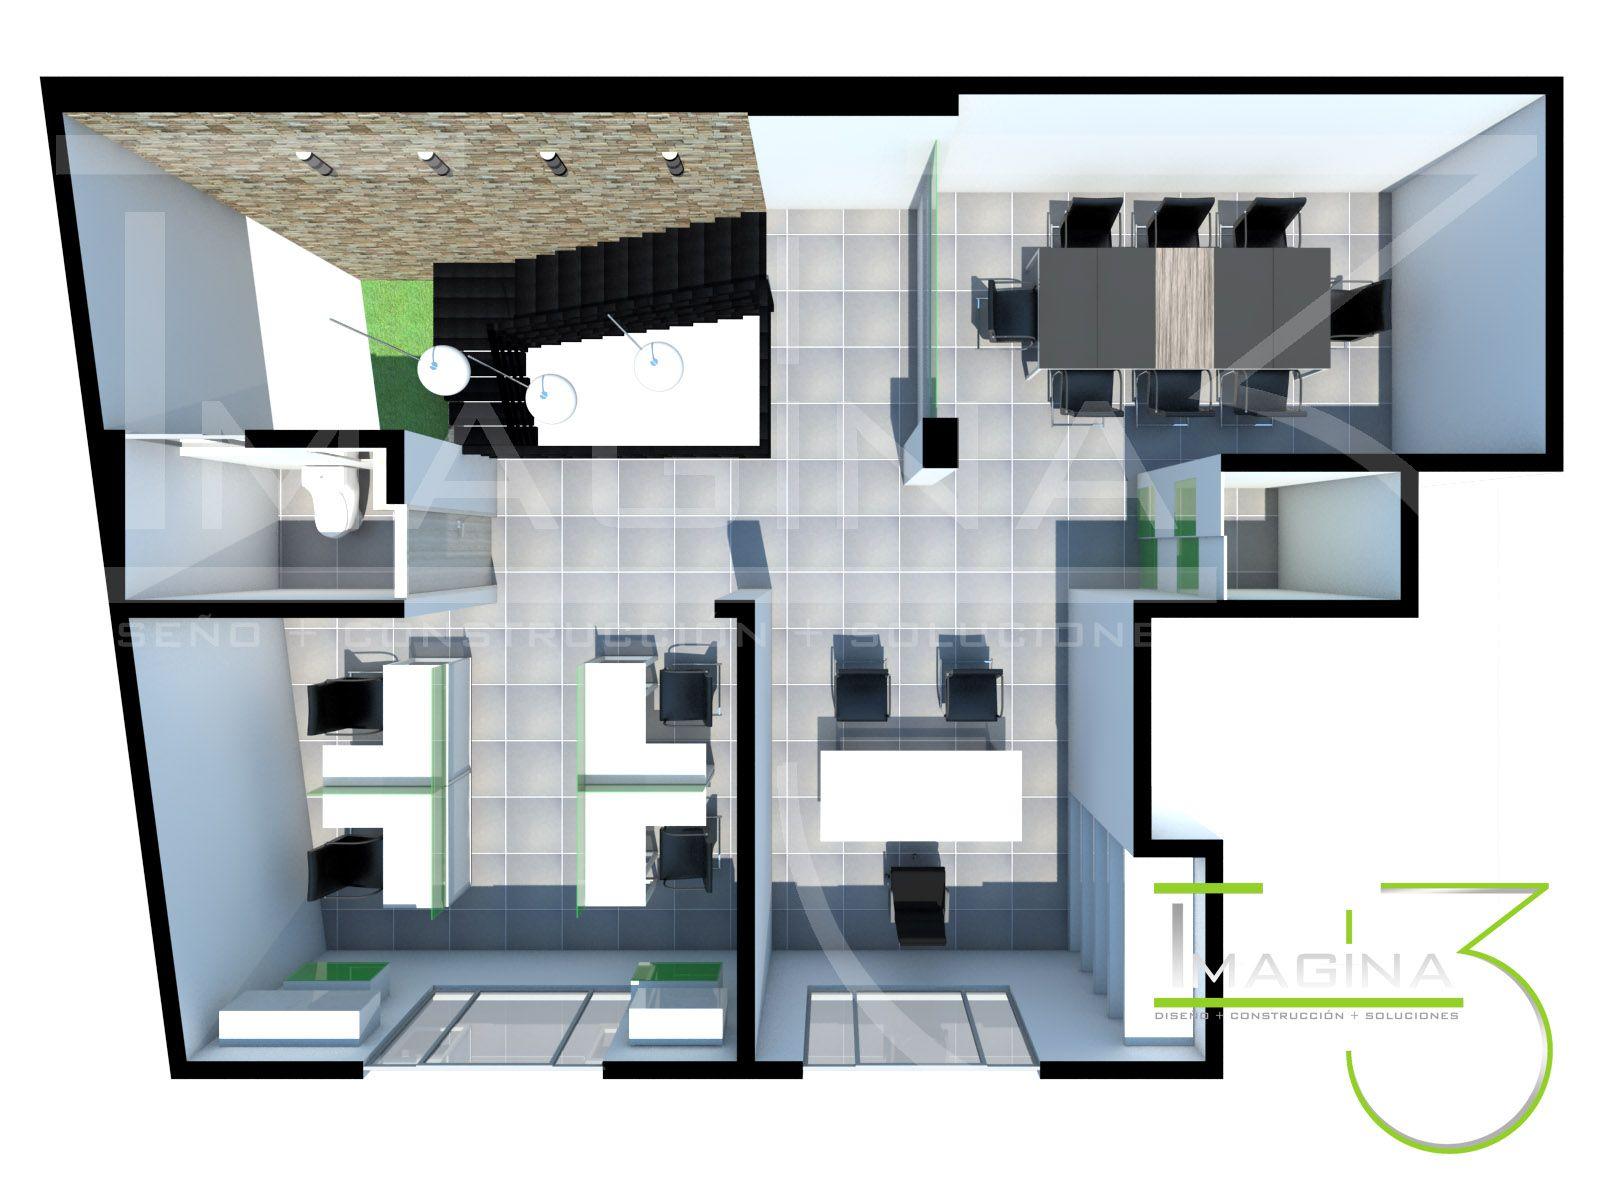 Diseño oficinas, distribución de espacios. Animación 3d gerencia@imagina3.co / + 57 321 324 7617 / +57 (8) 2 76 21 23 / https://www.facebook.com/imagina3.arquitecturayconstruccion